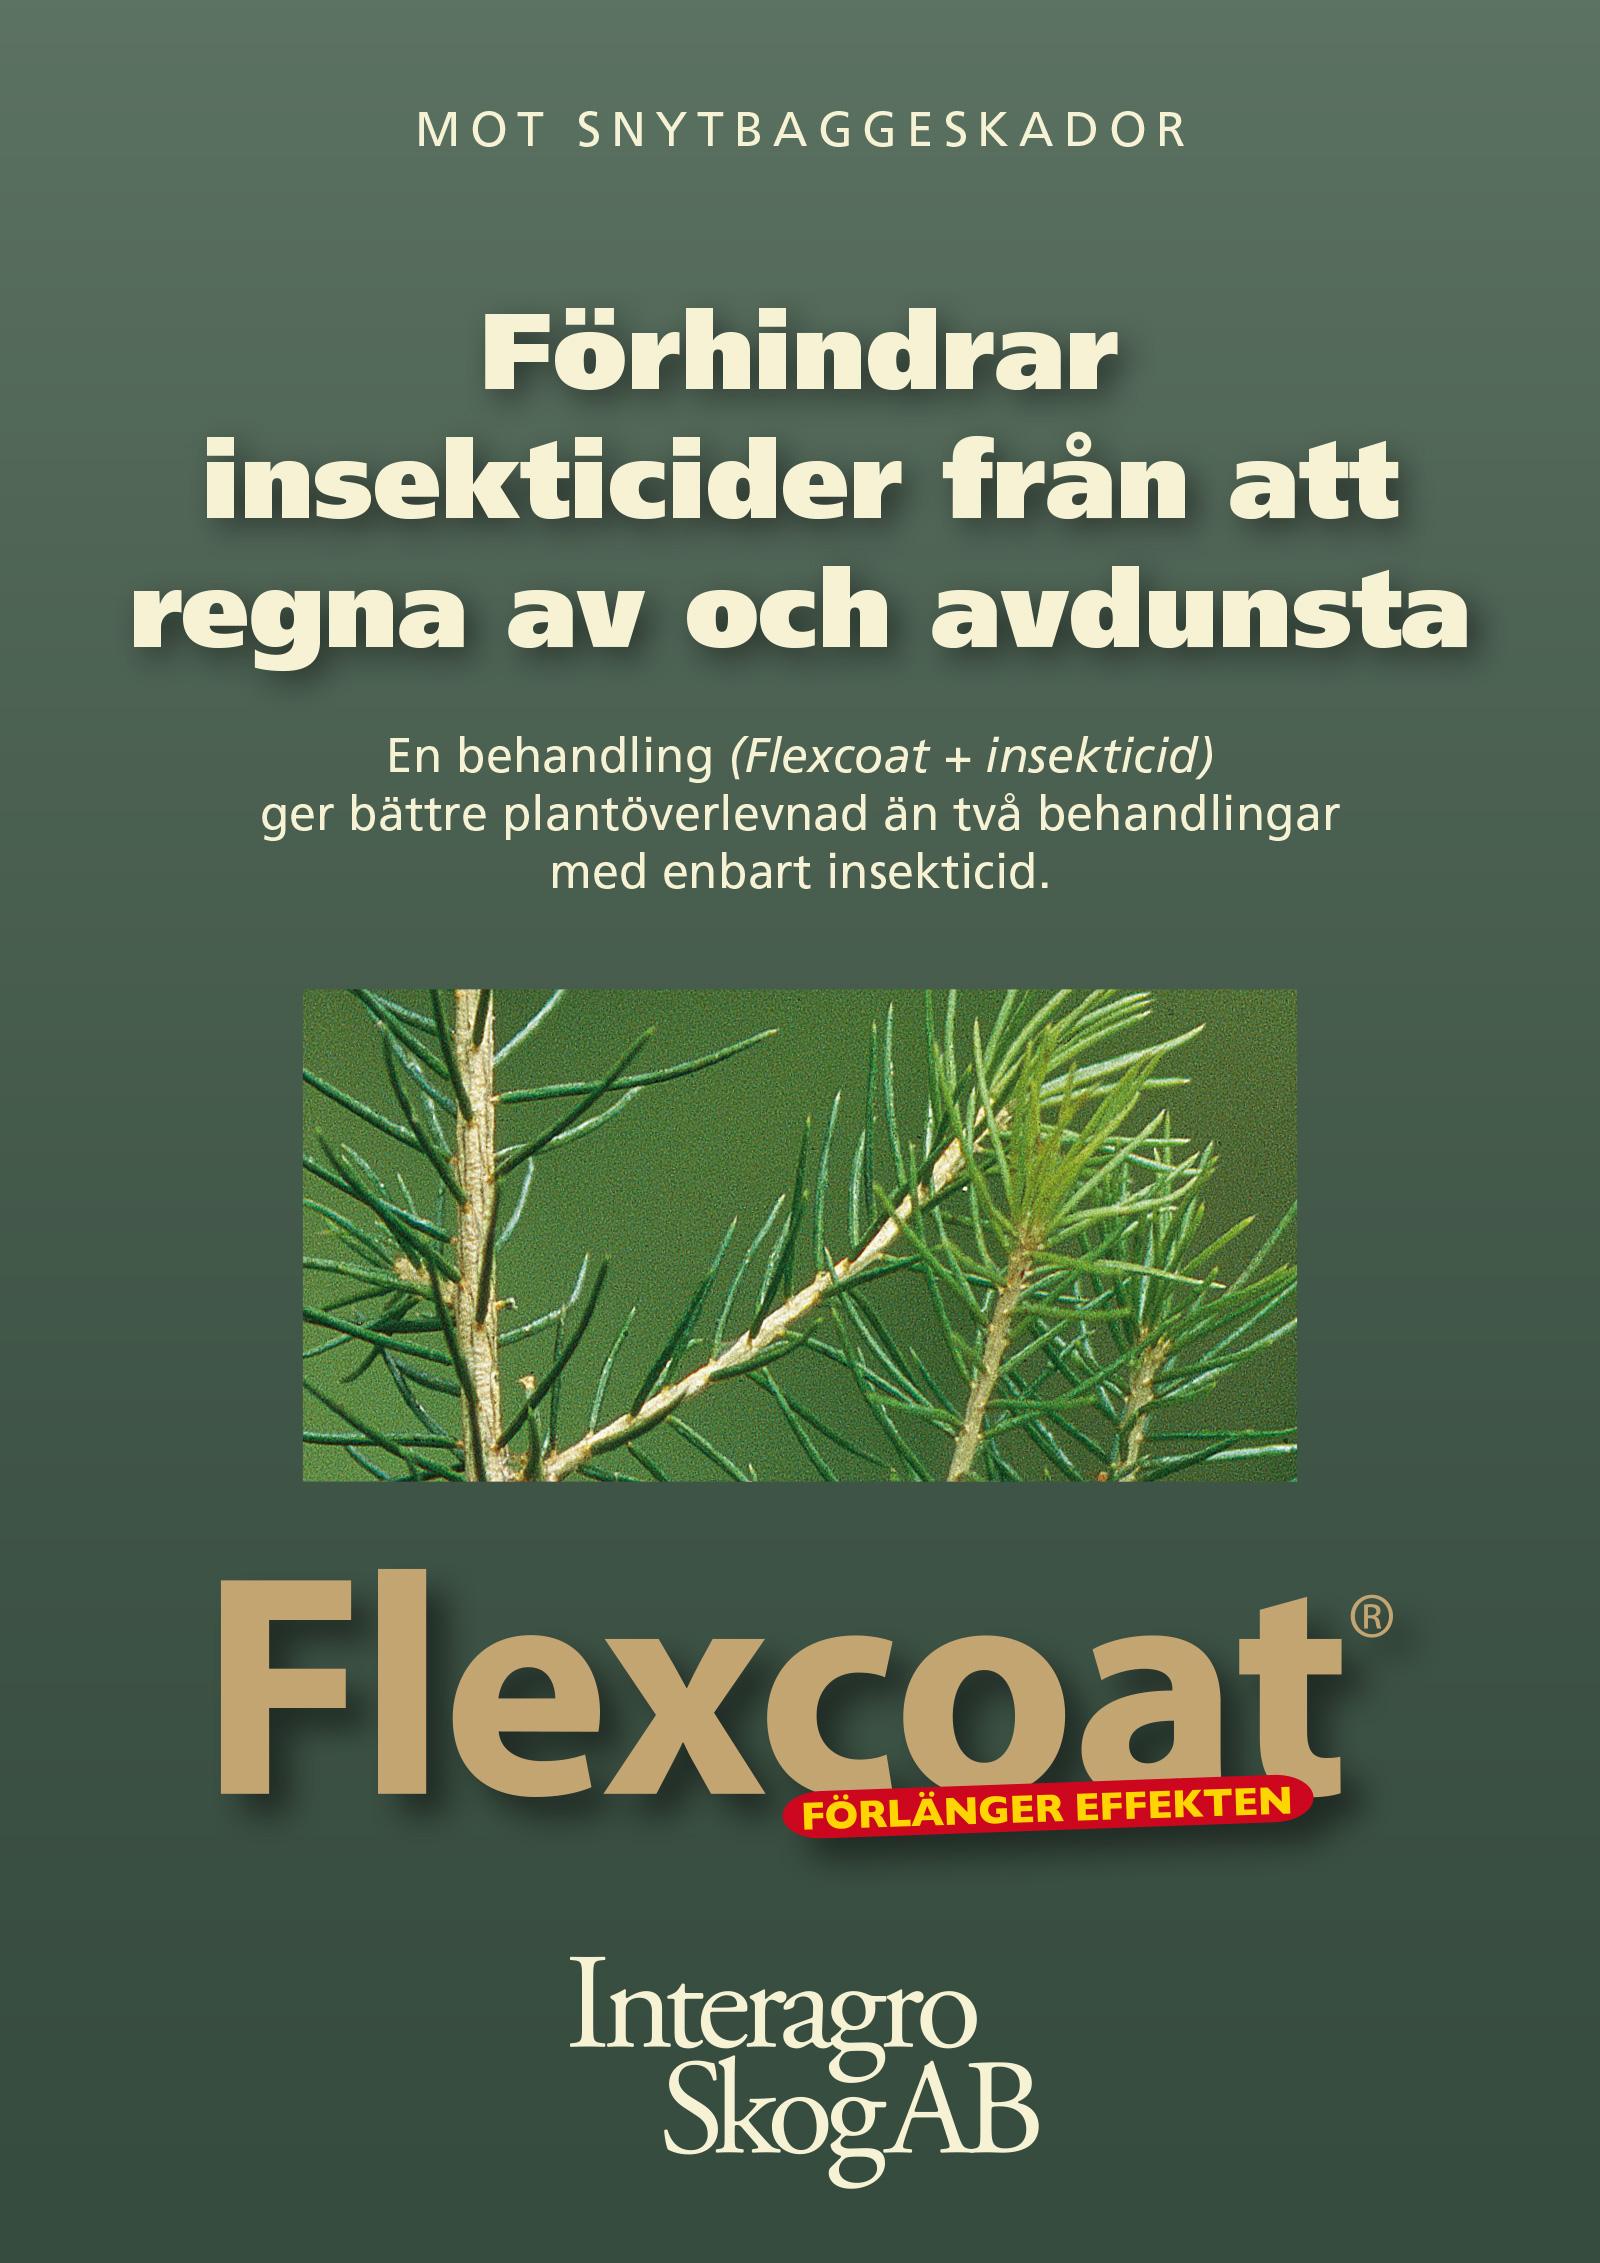 interagroskog-flexcoat-2019